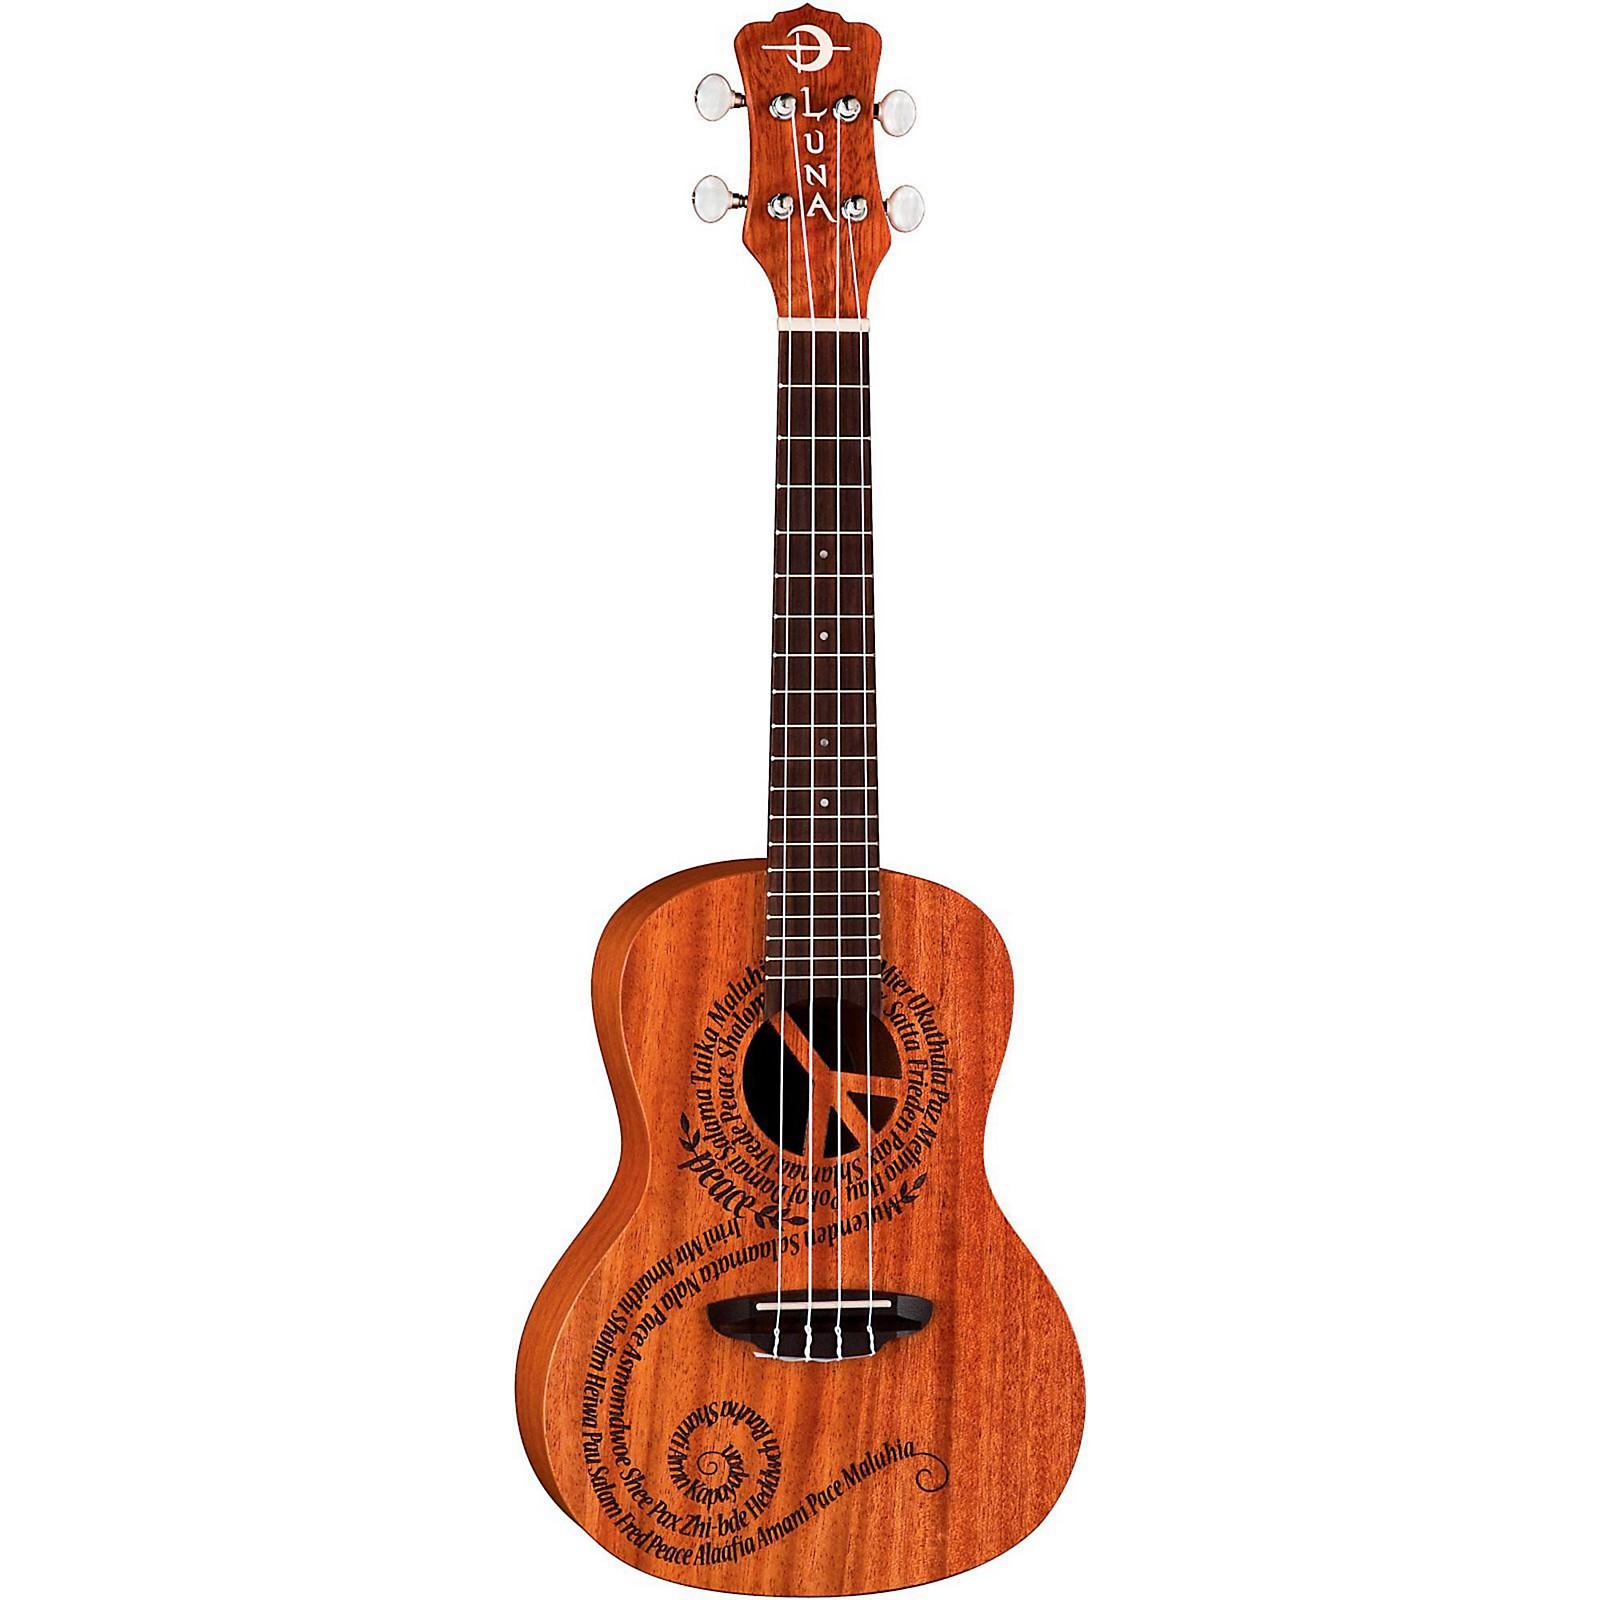 Luna Guitars Maluhia Concert Ukulele